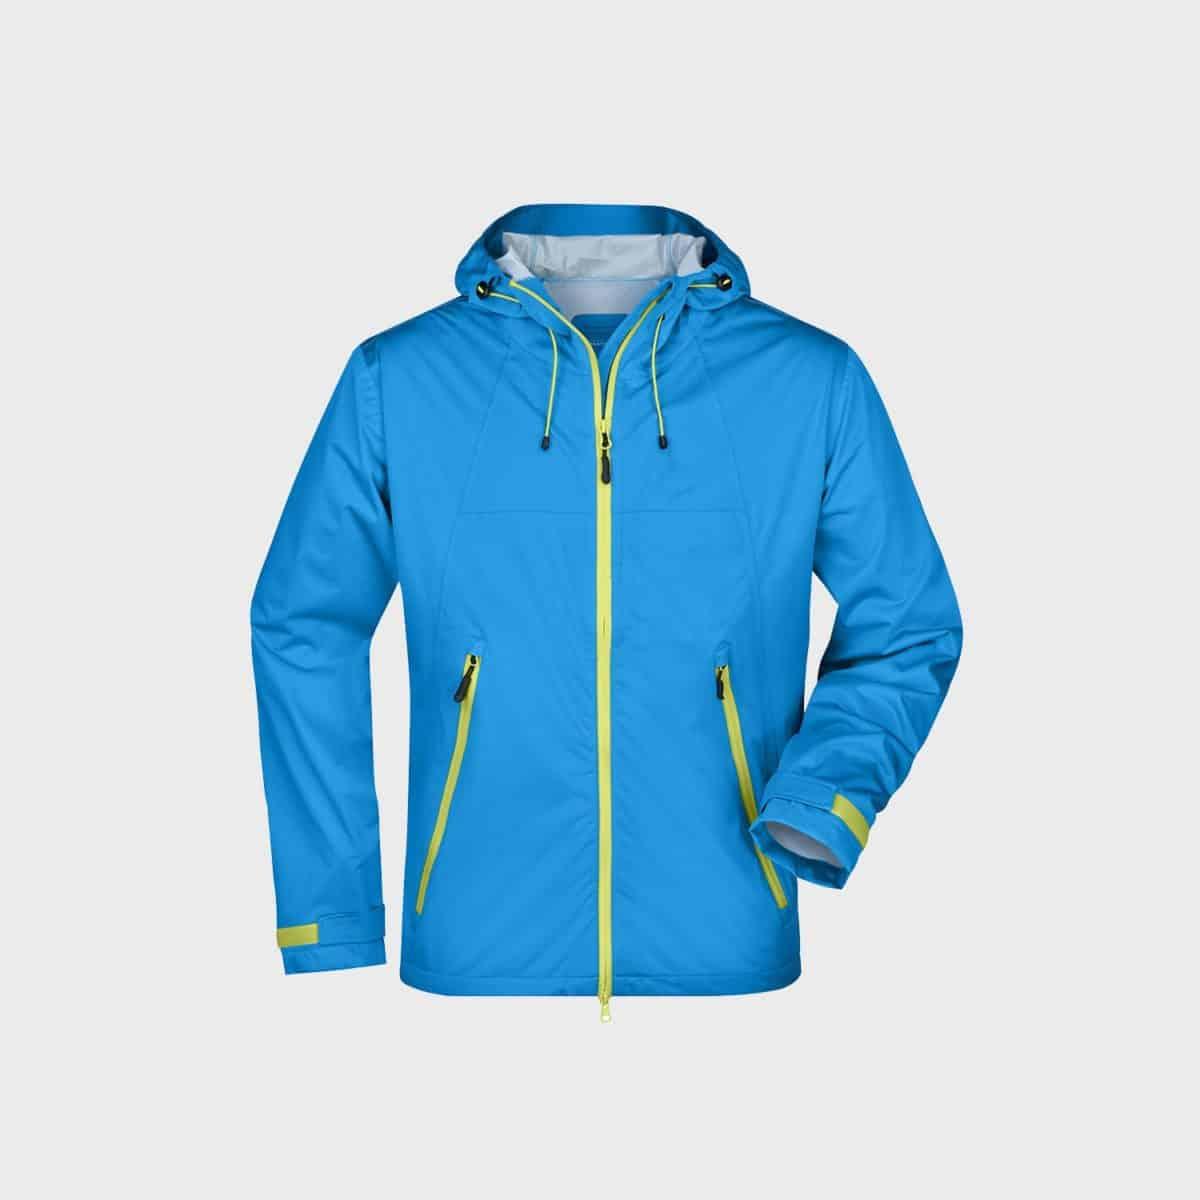 outdoor-jacket-herren-aqua-kaufen-besticken_stickmanufaktur